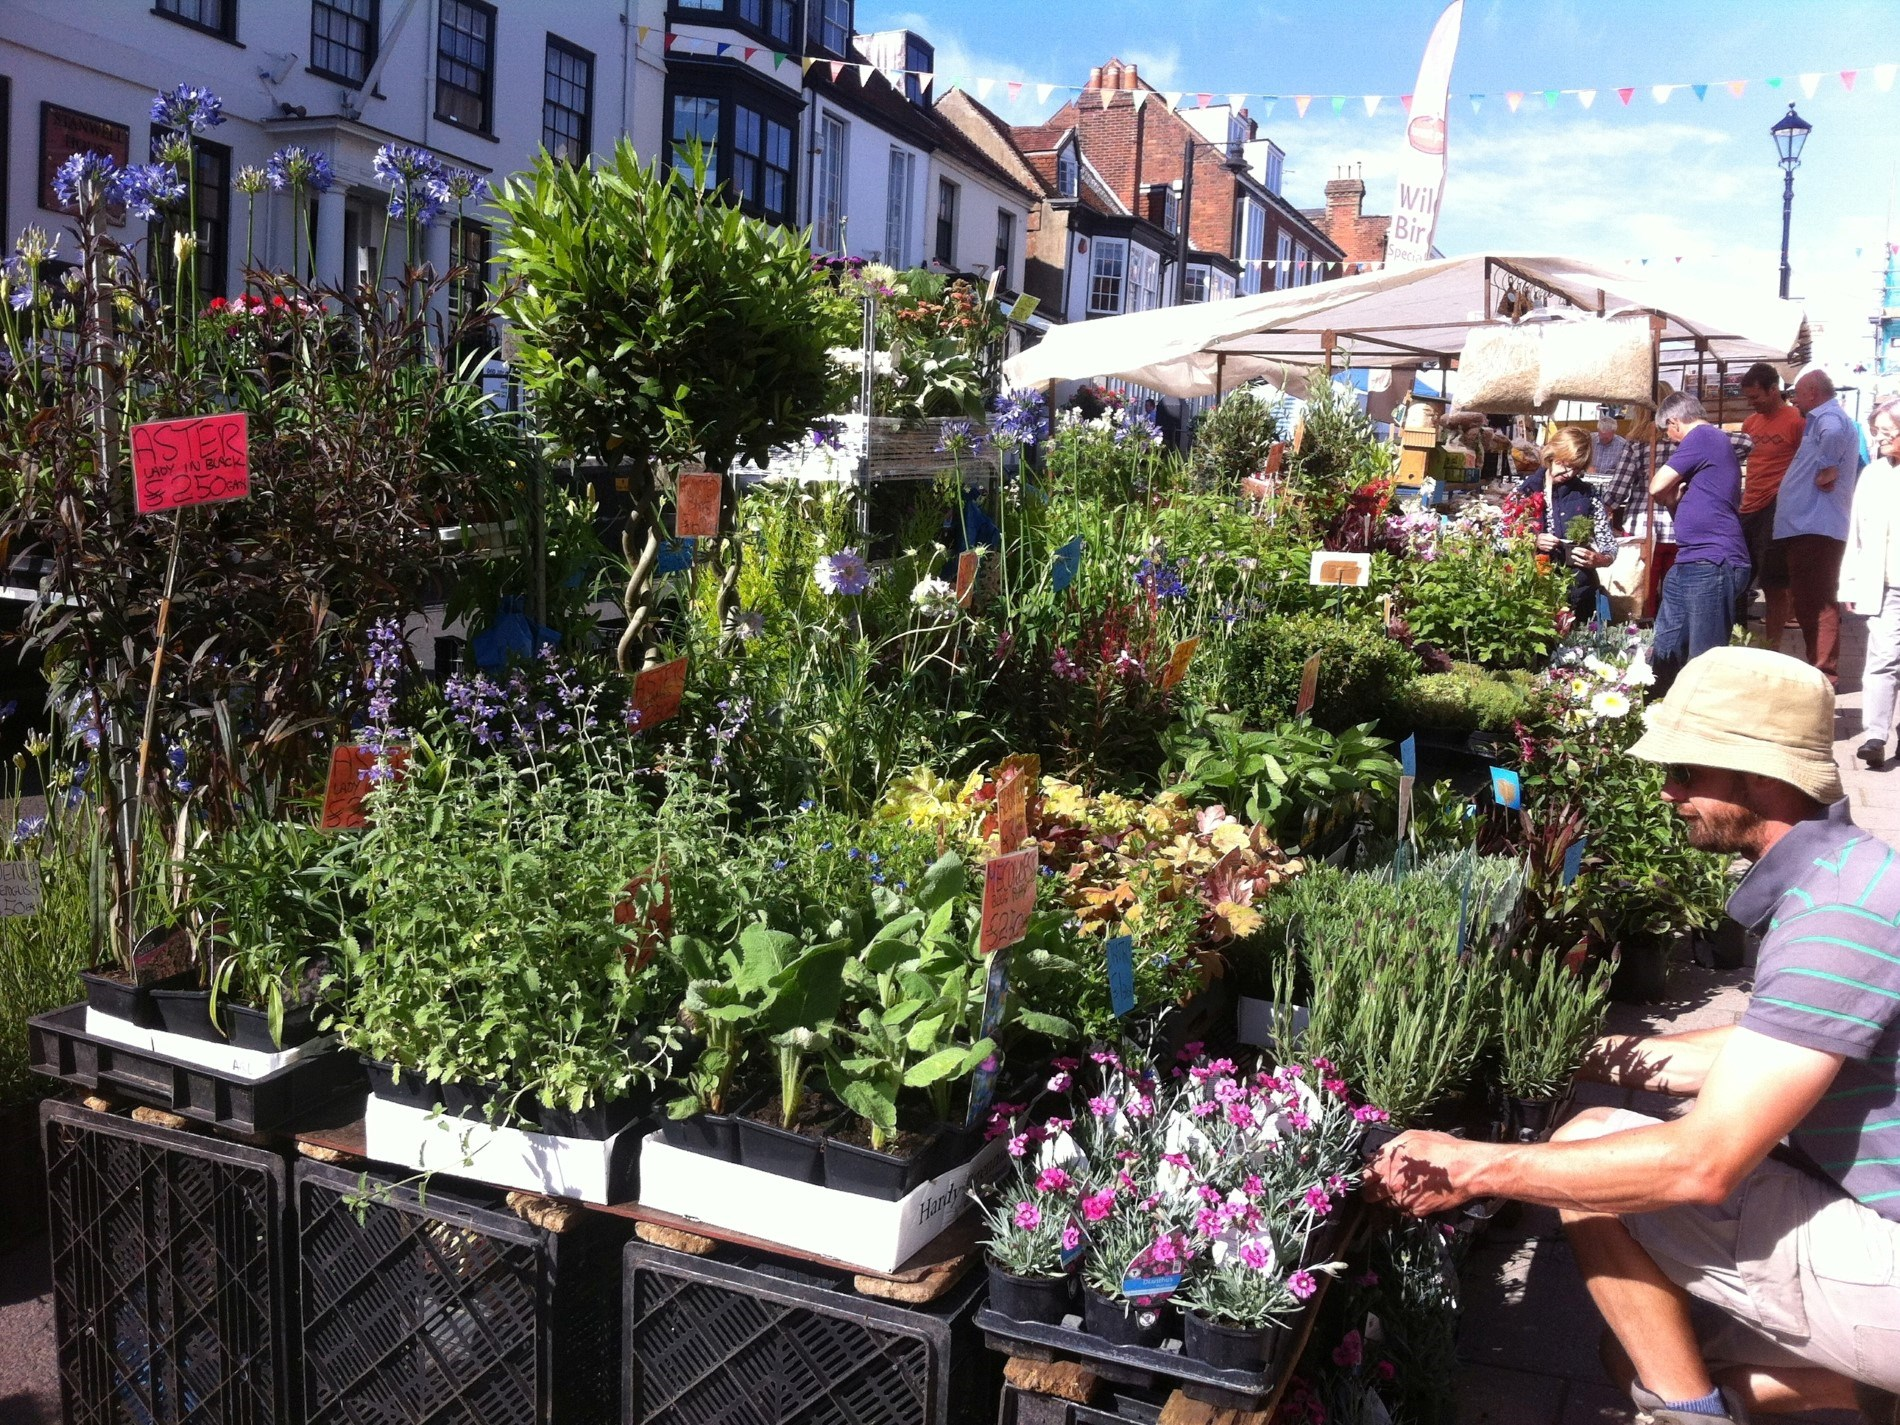 Enjoy a stroll through the Saturday market in the High Street